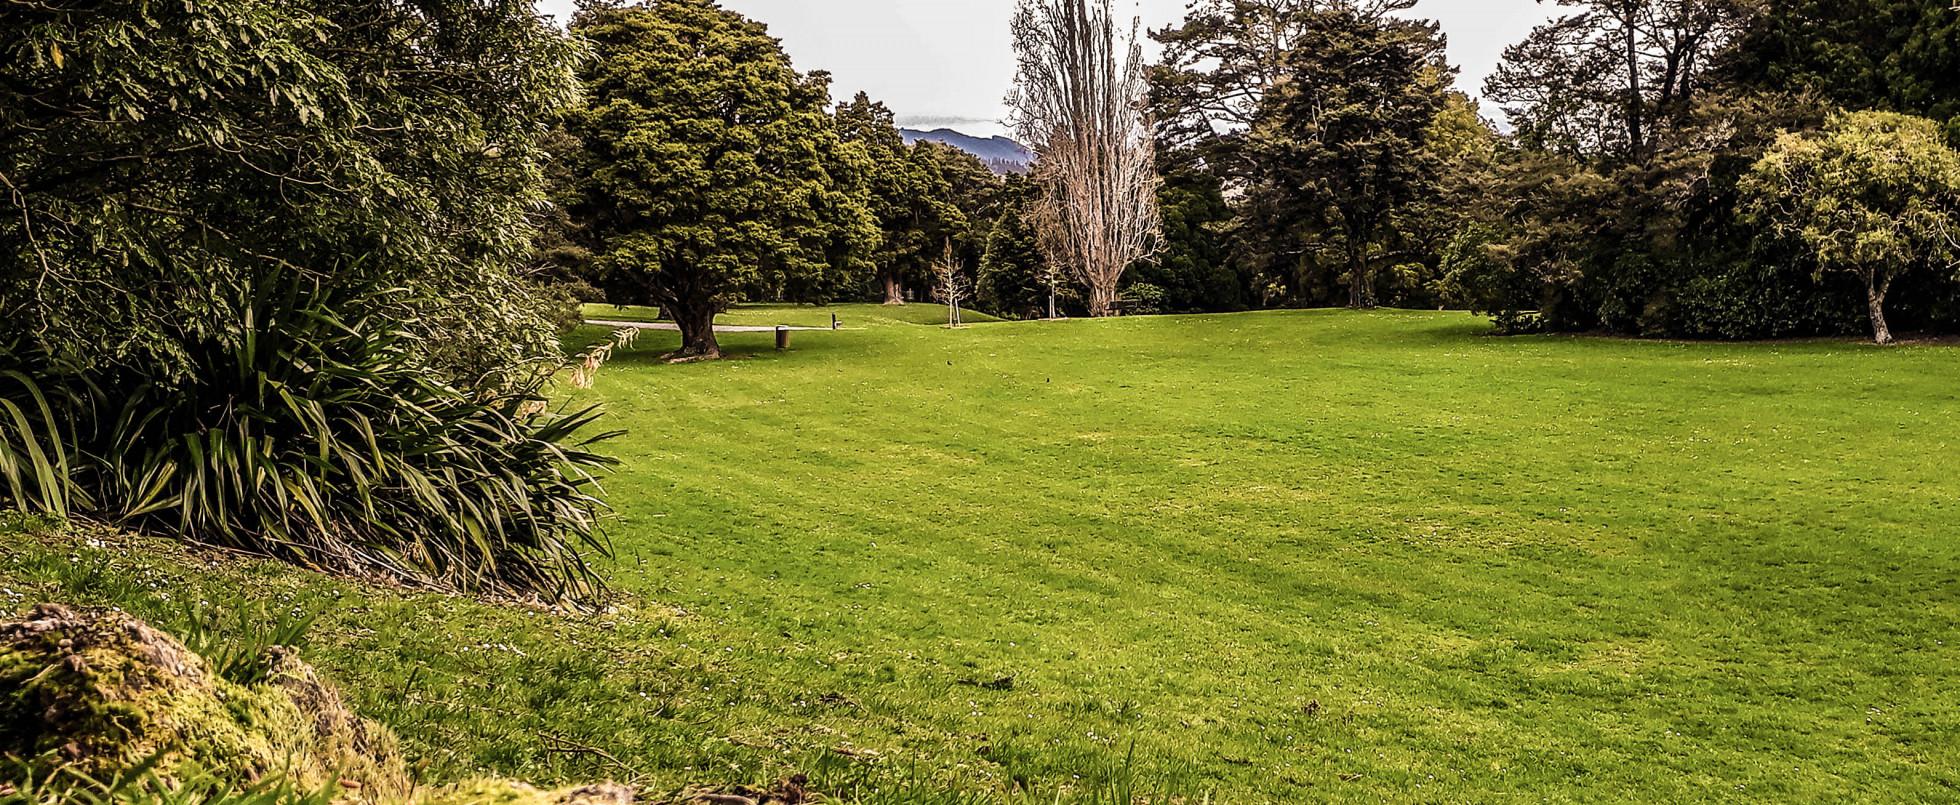 Harcourt Park: The Gardens of Isengard